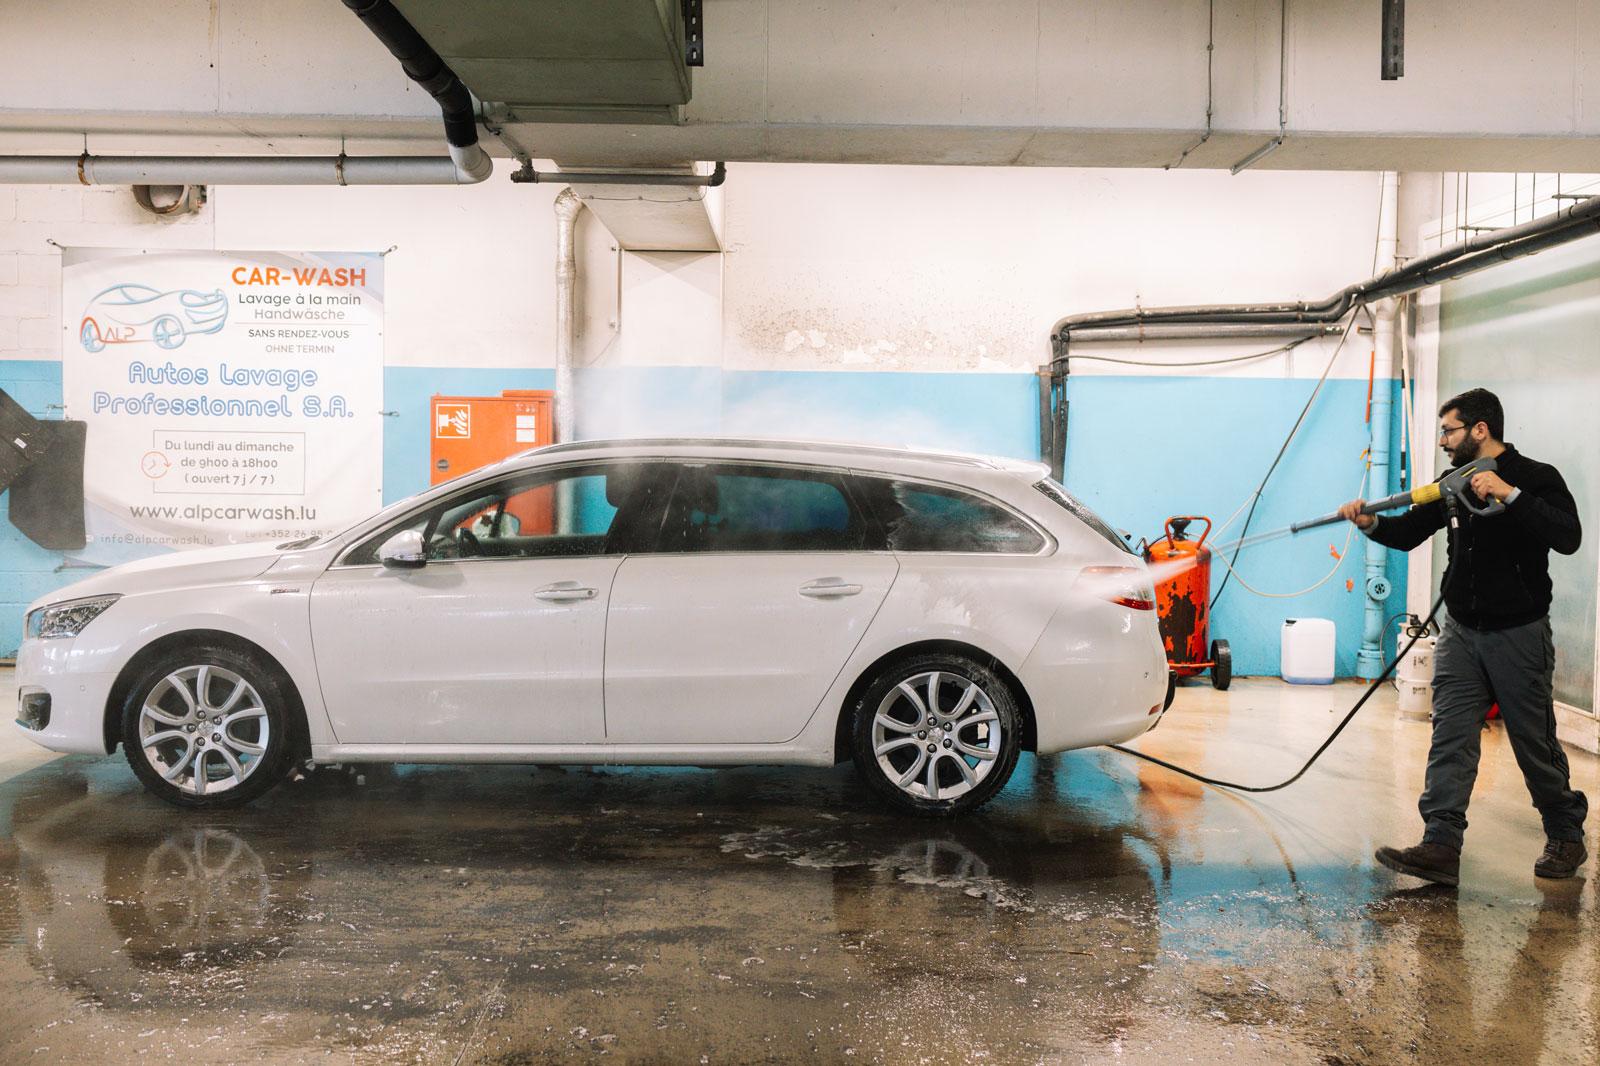 Car Wash - Knauf Shopping Center - Pommerloch